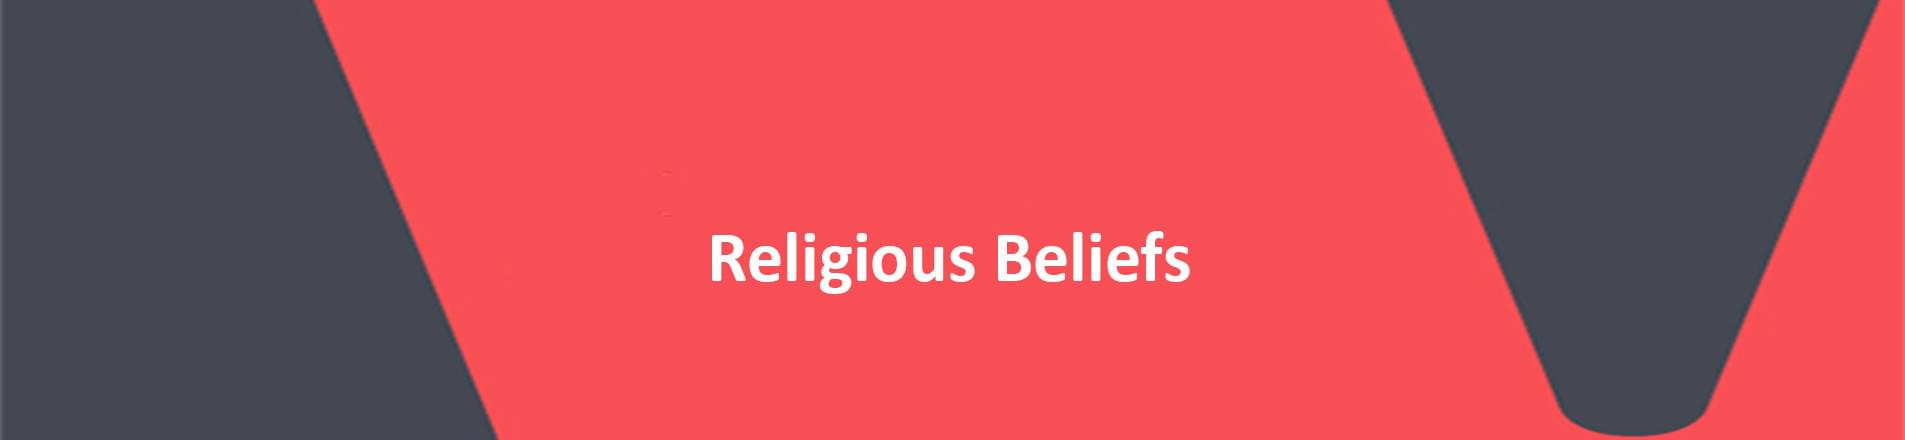 Words Religious beliefs on red VERCIDA branded background